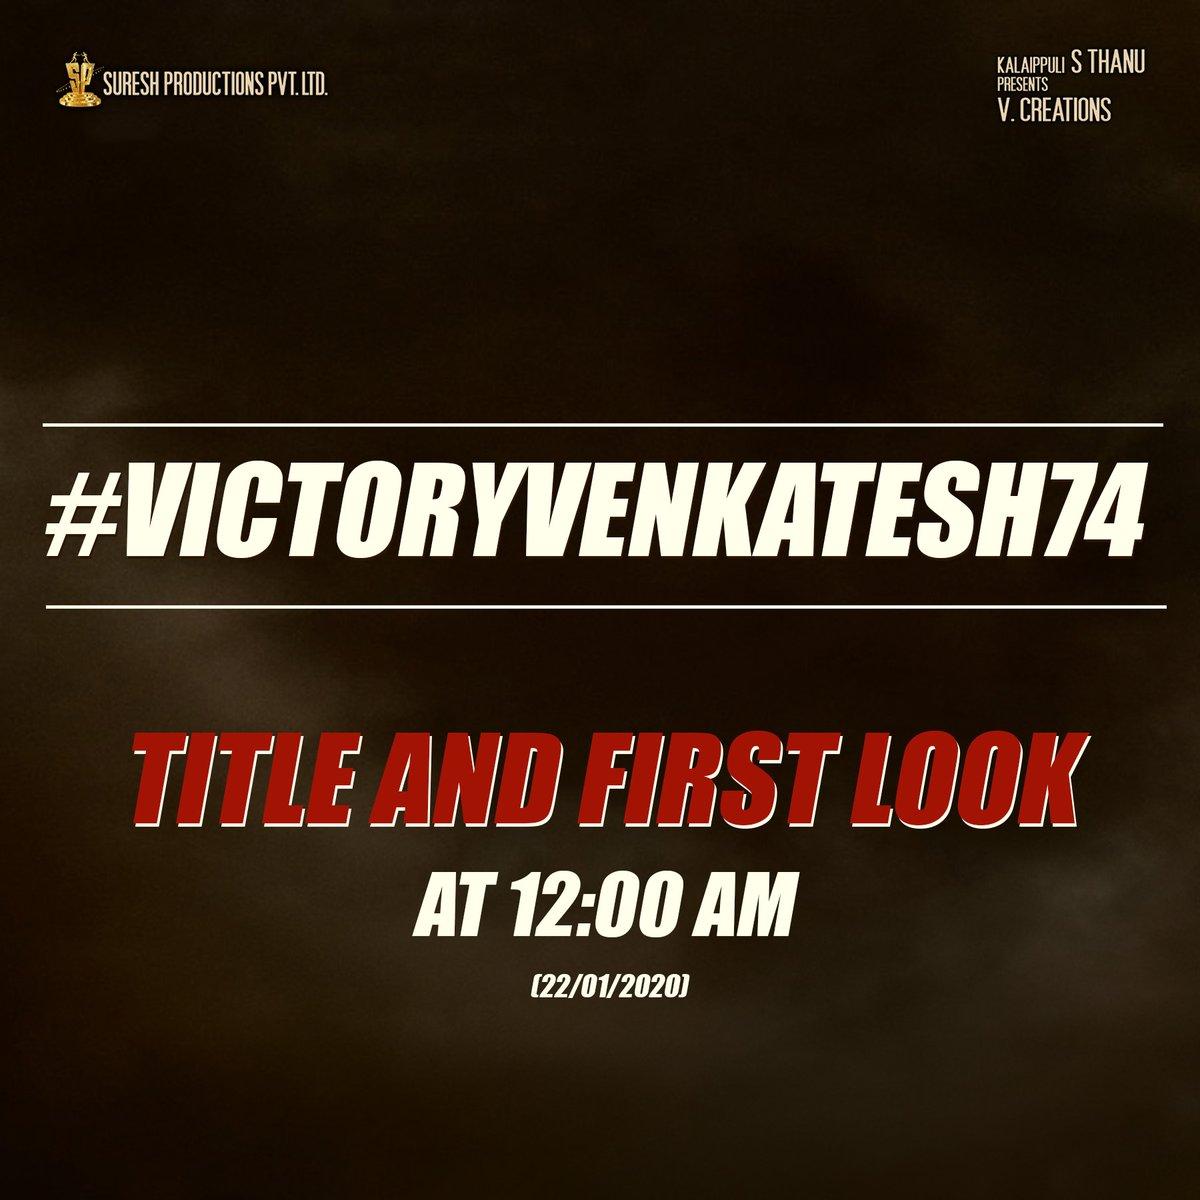 #VictoryVenkatesh74 L O A D I N G... <br>http://pic.twitter.com/HKayt9aYwX